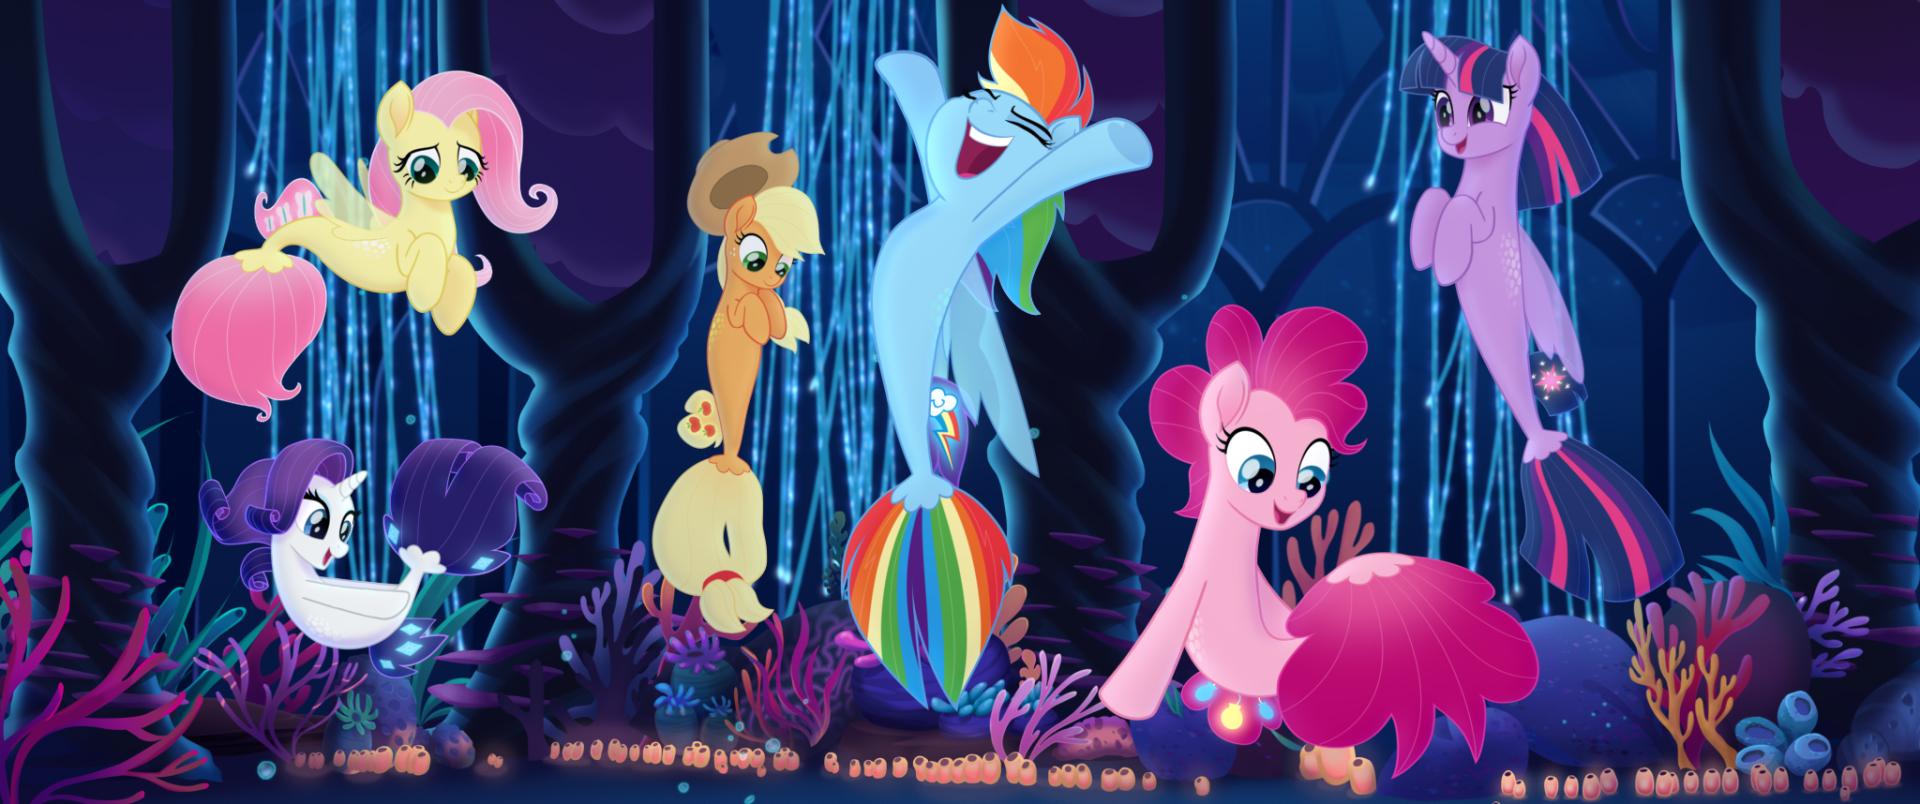 My Little Pony в кино смотреть фото